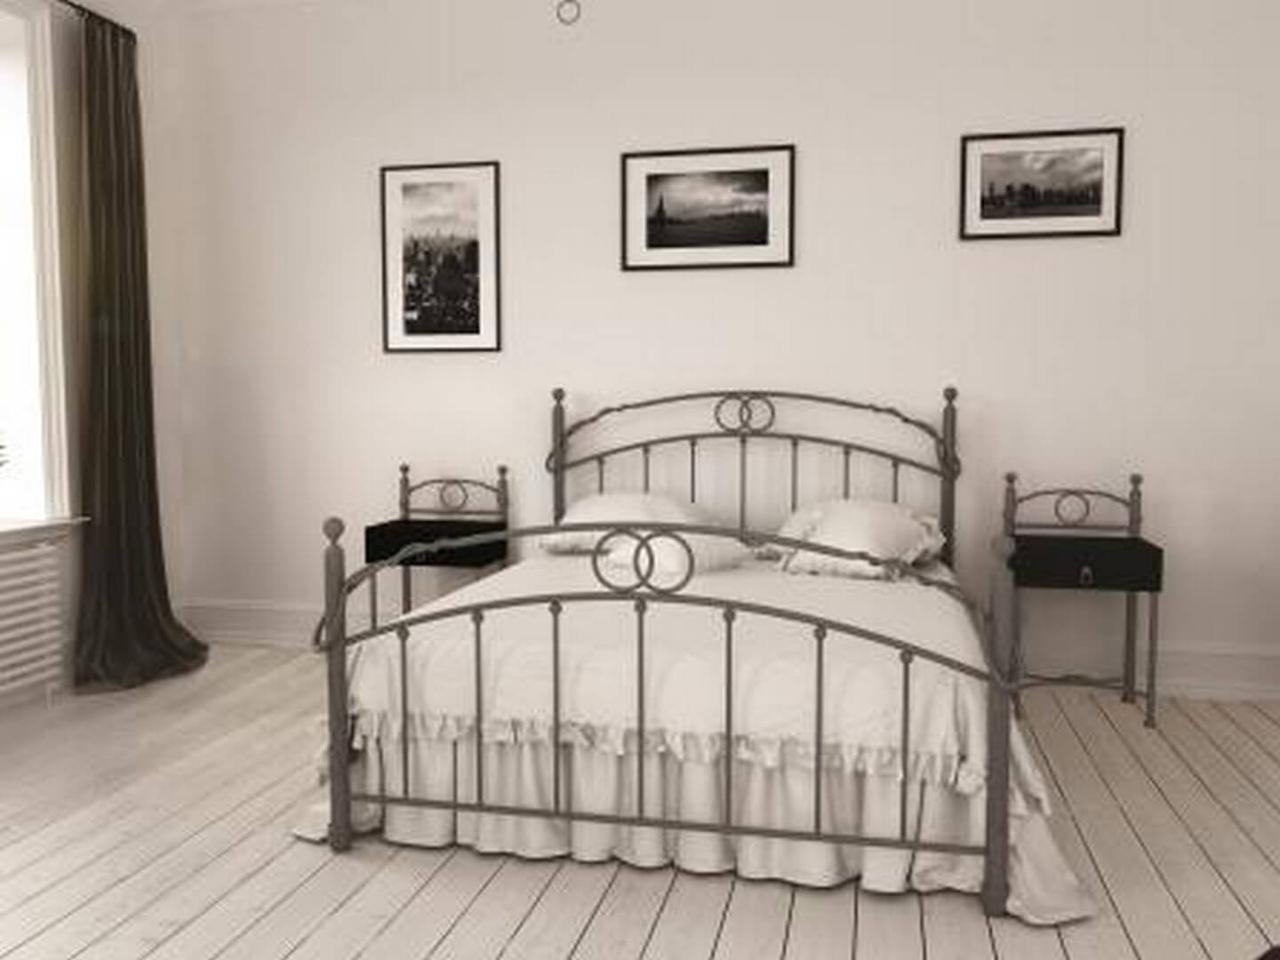 Ліжко коване в спальню Тоскана  Метал-Дизайн